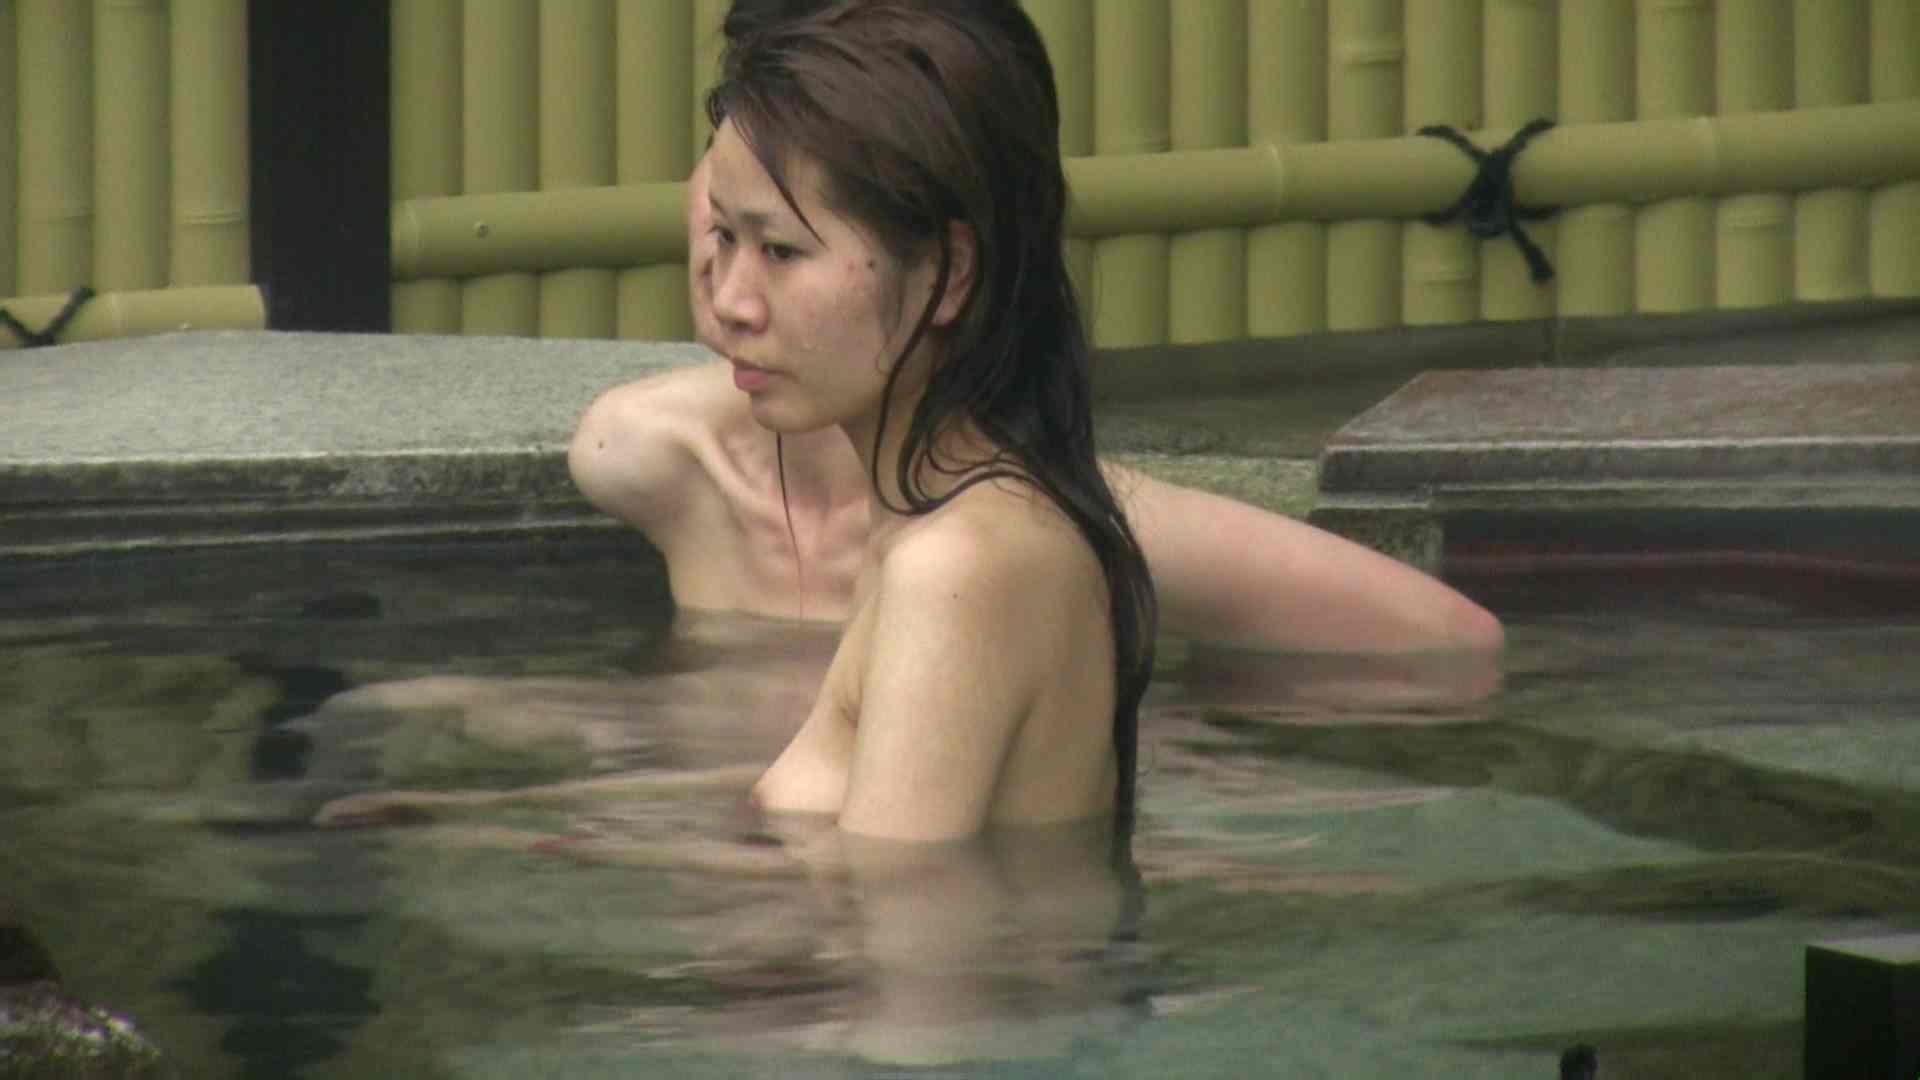 Aquaな露天風呂Vol.07 盗撮シリーズ   露天風呂編  94PIX 15